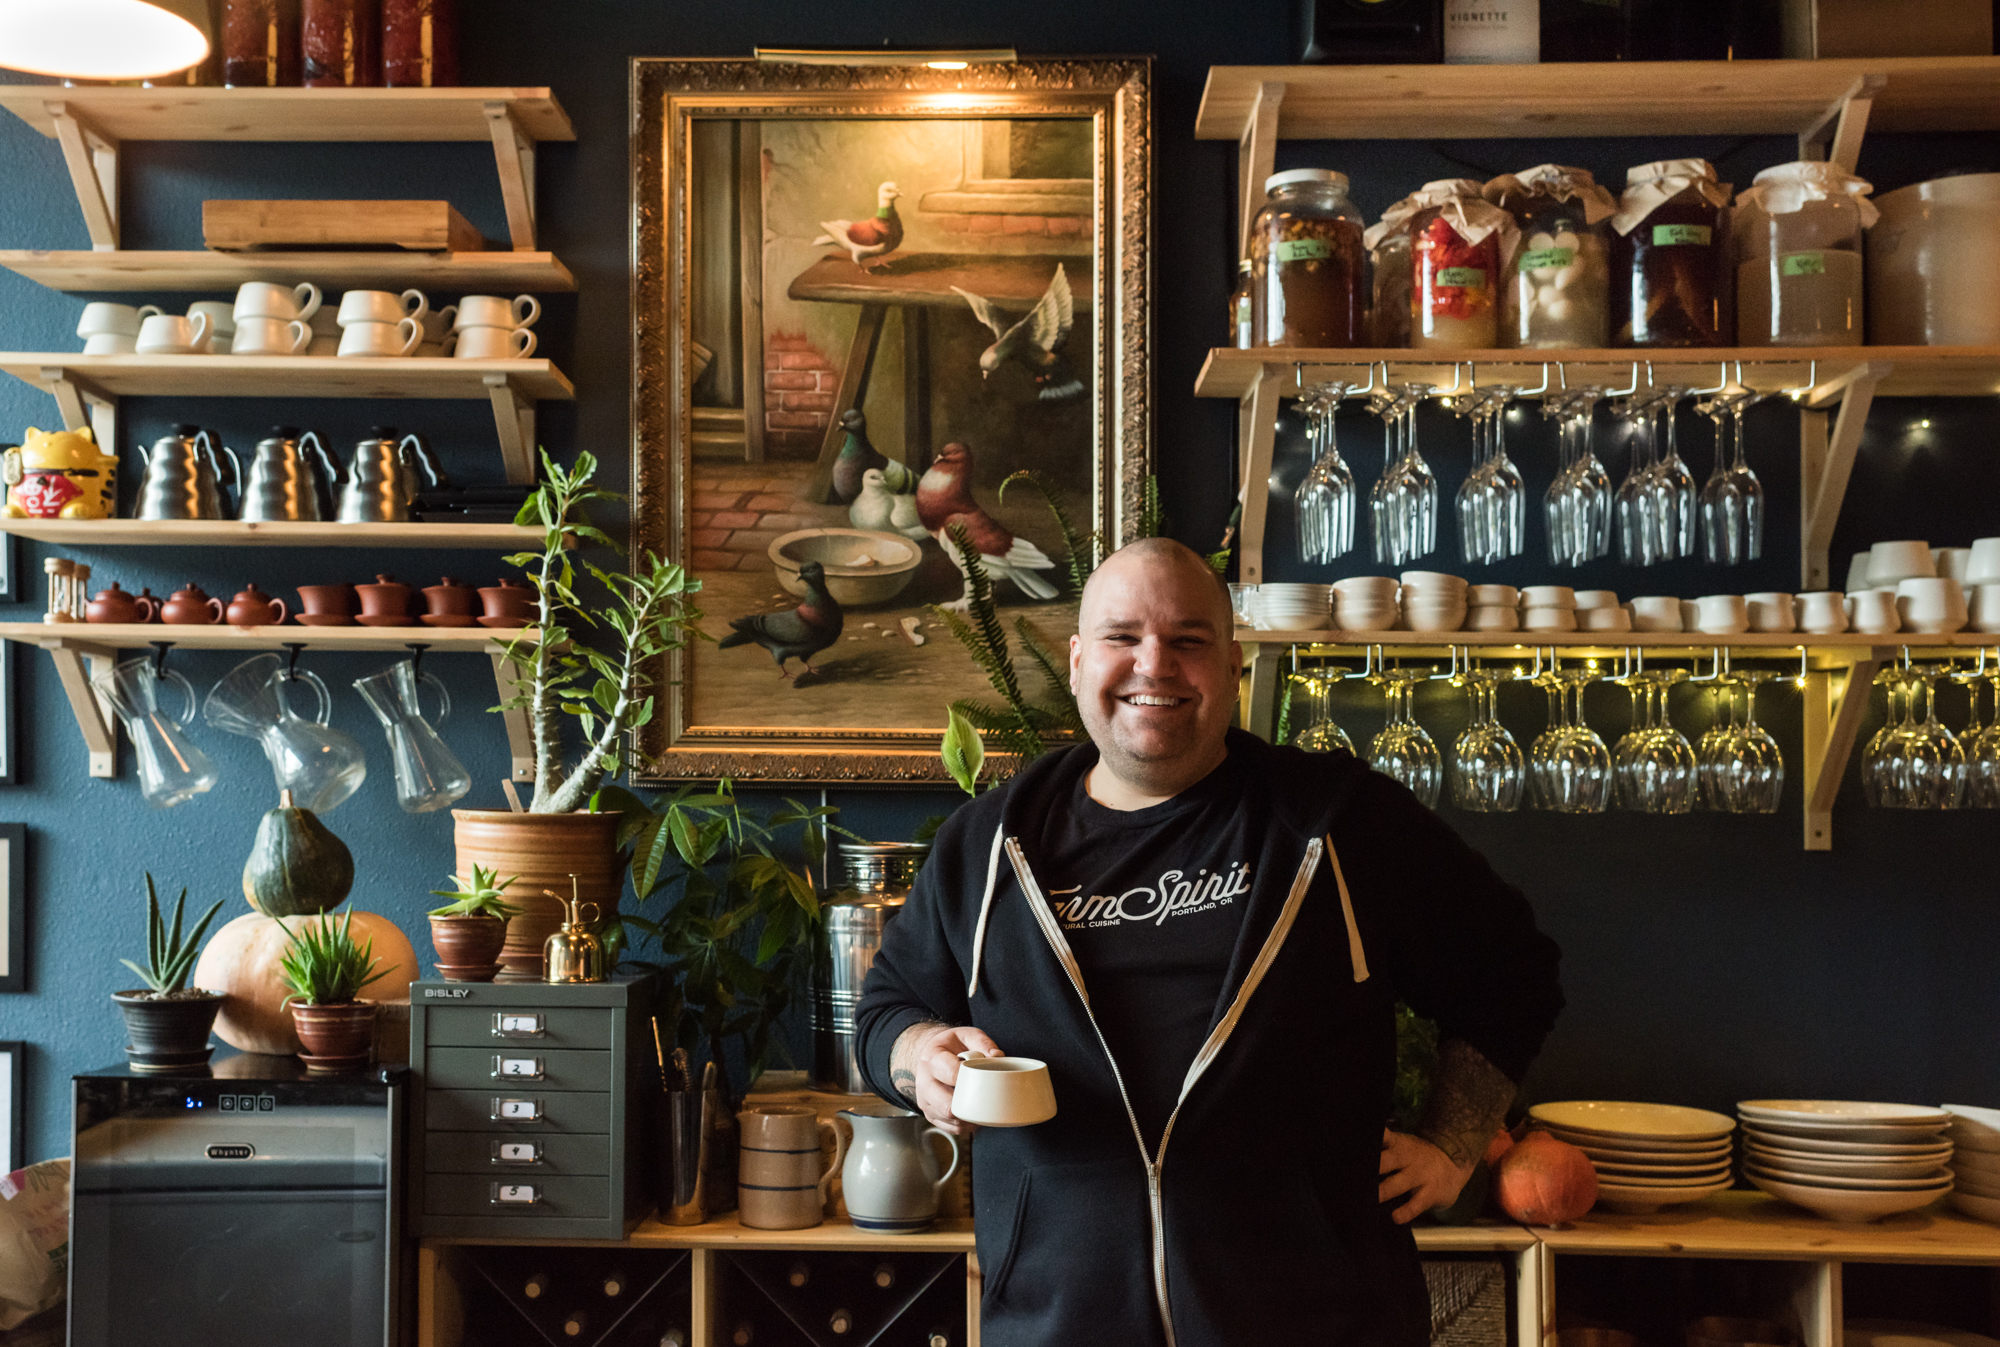 Chef Aaron Adams of Farm Spirit